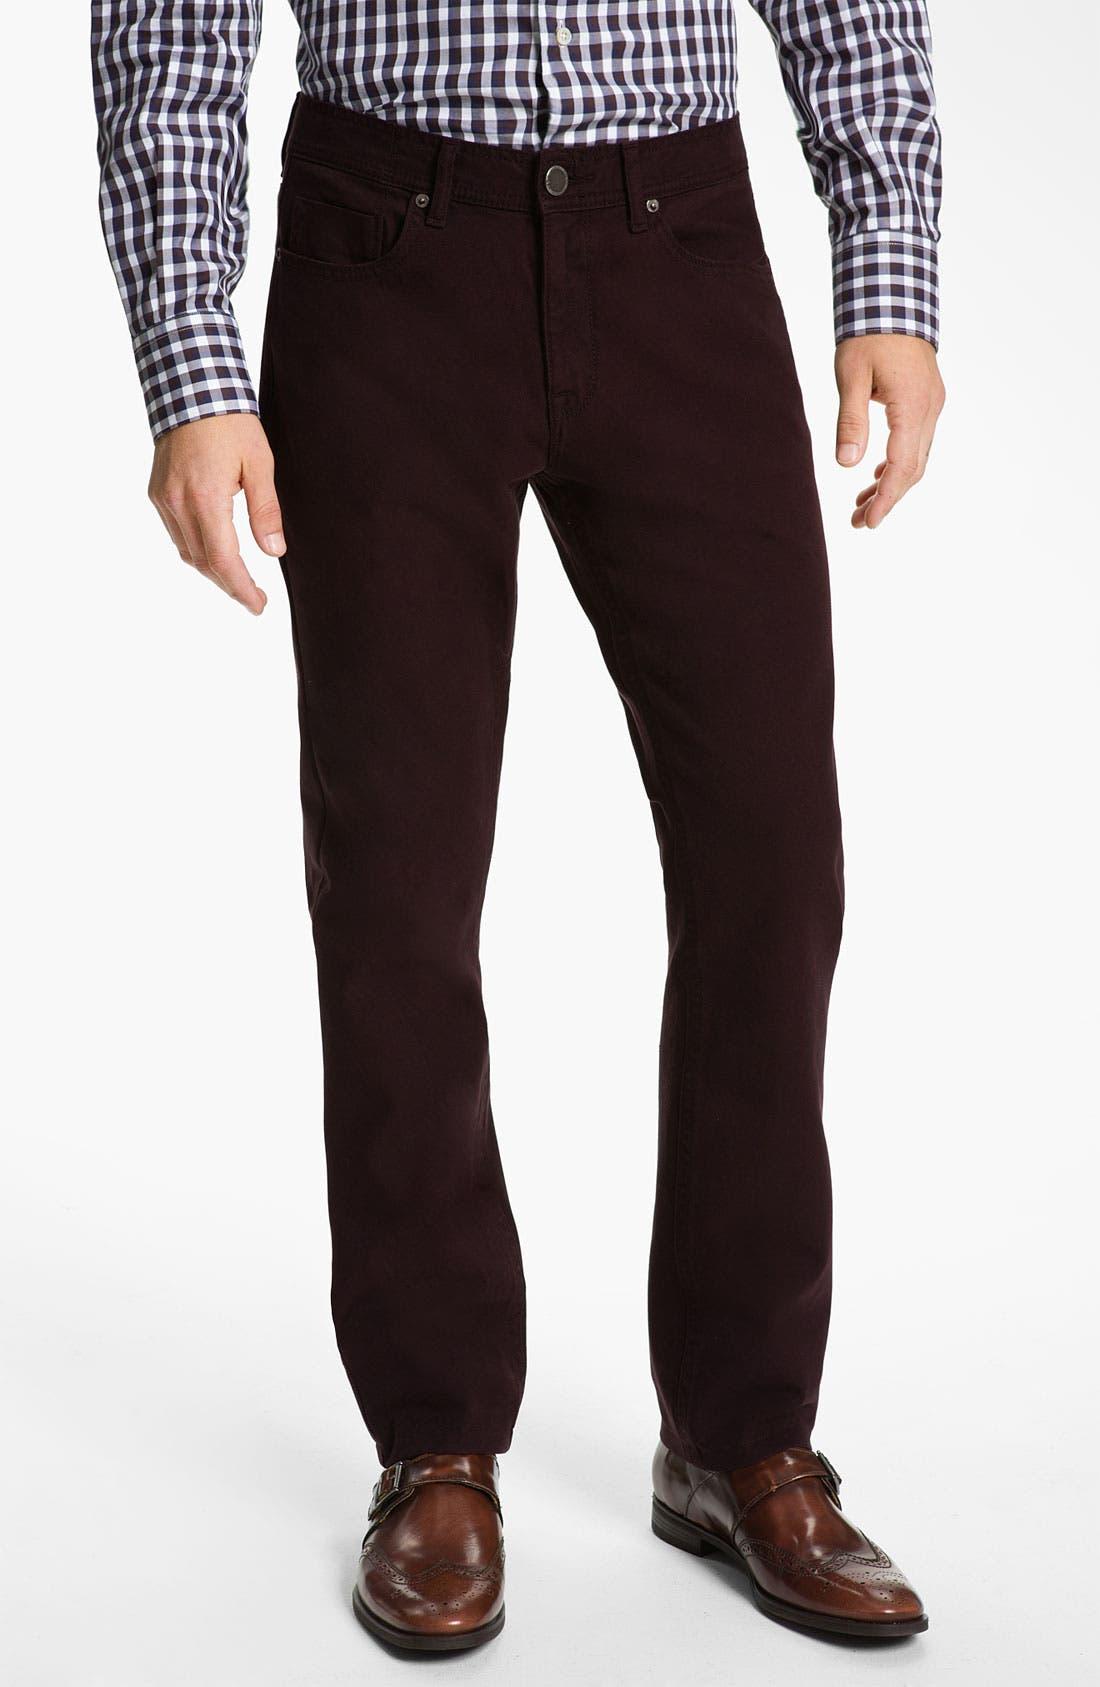 Alternate Image 1 Selected - DL1961 'Vince' Straight Leg Jeans (Redwood) (Online Only)